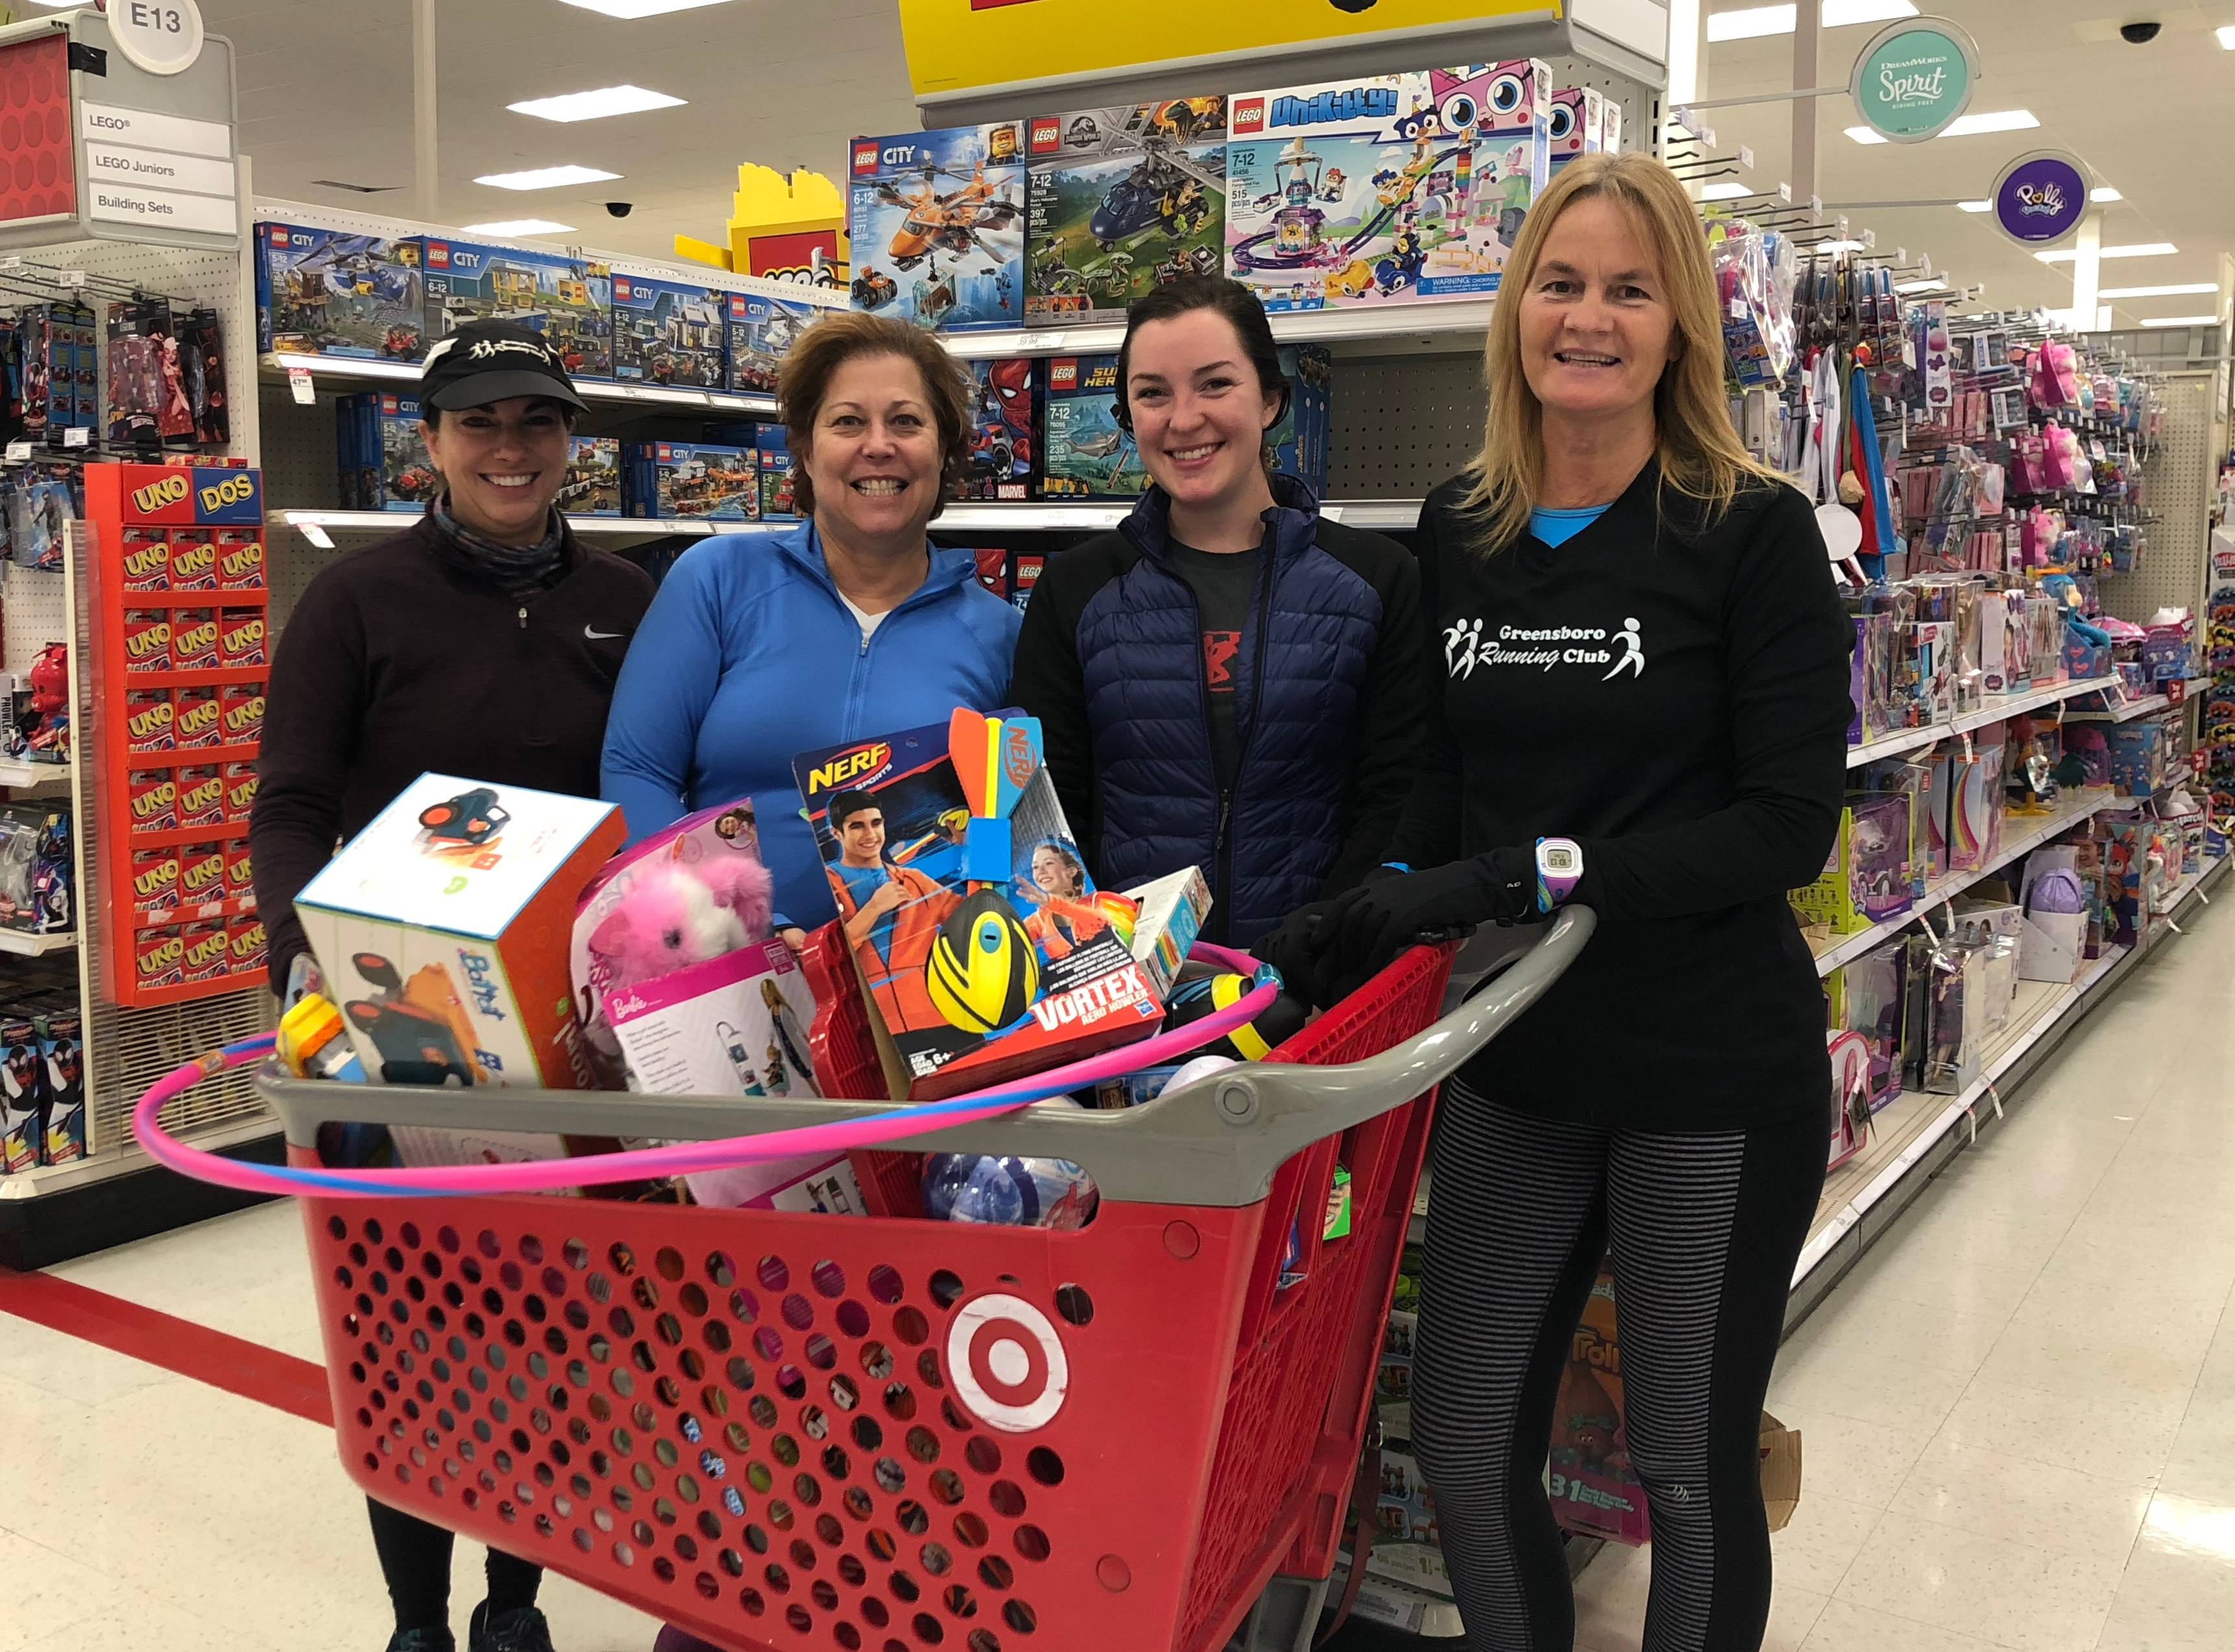 2018 Giving Back - Volunteering - Donations